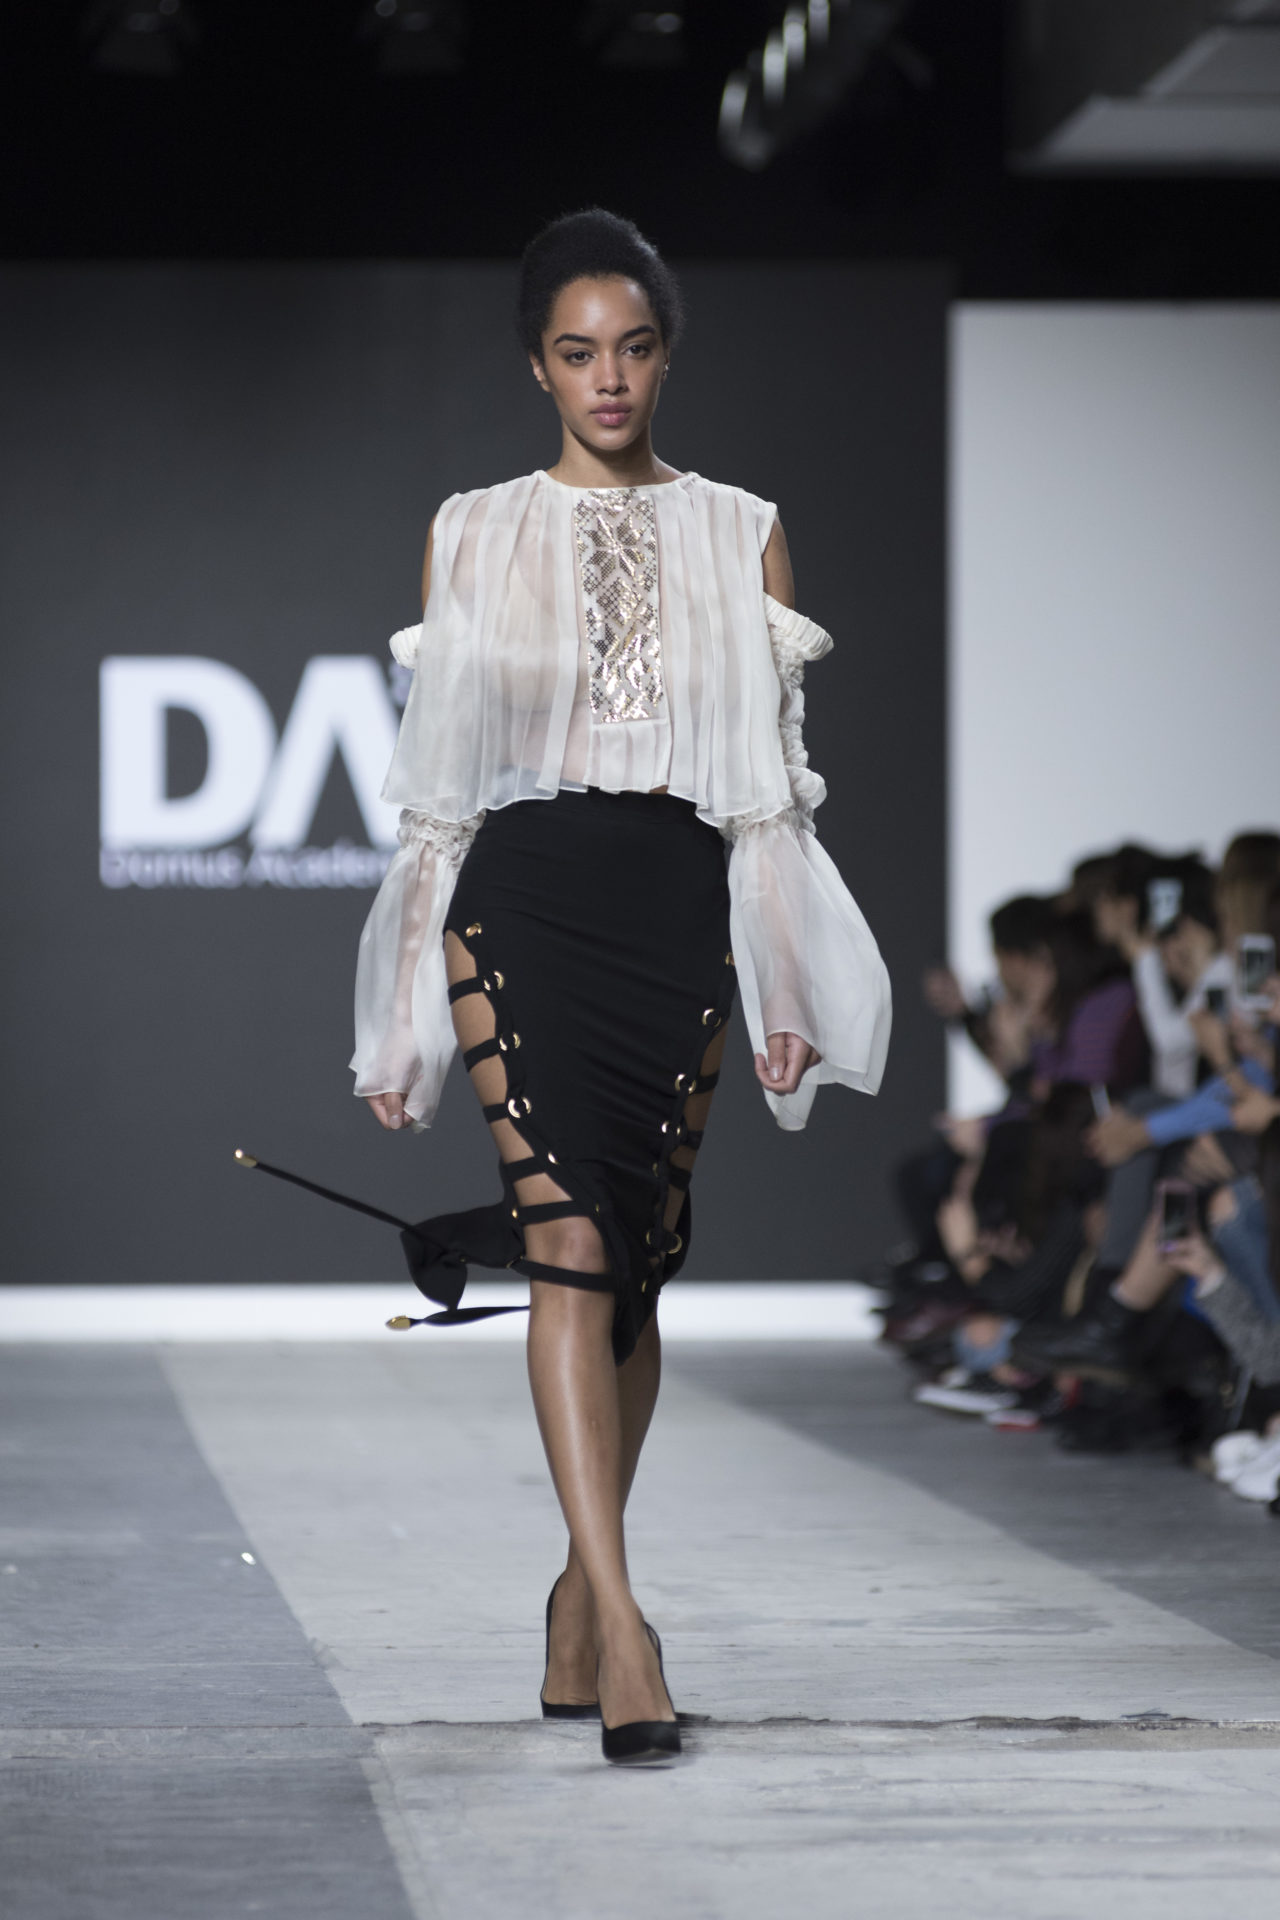 Fashion Designer: Gyanendu Baruah - Fashion Graduate Italia Fashion Show - Domus Academy